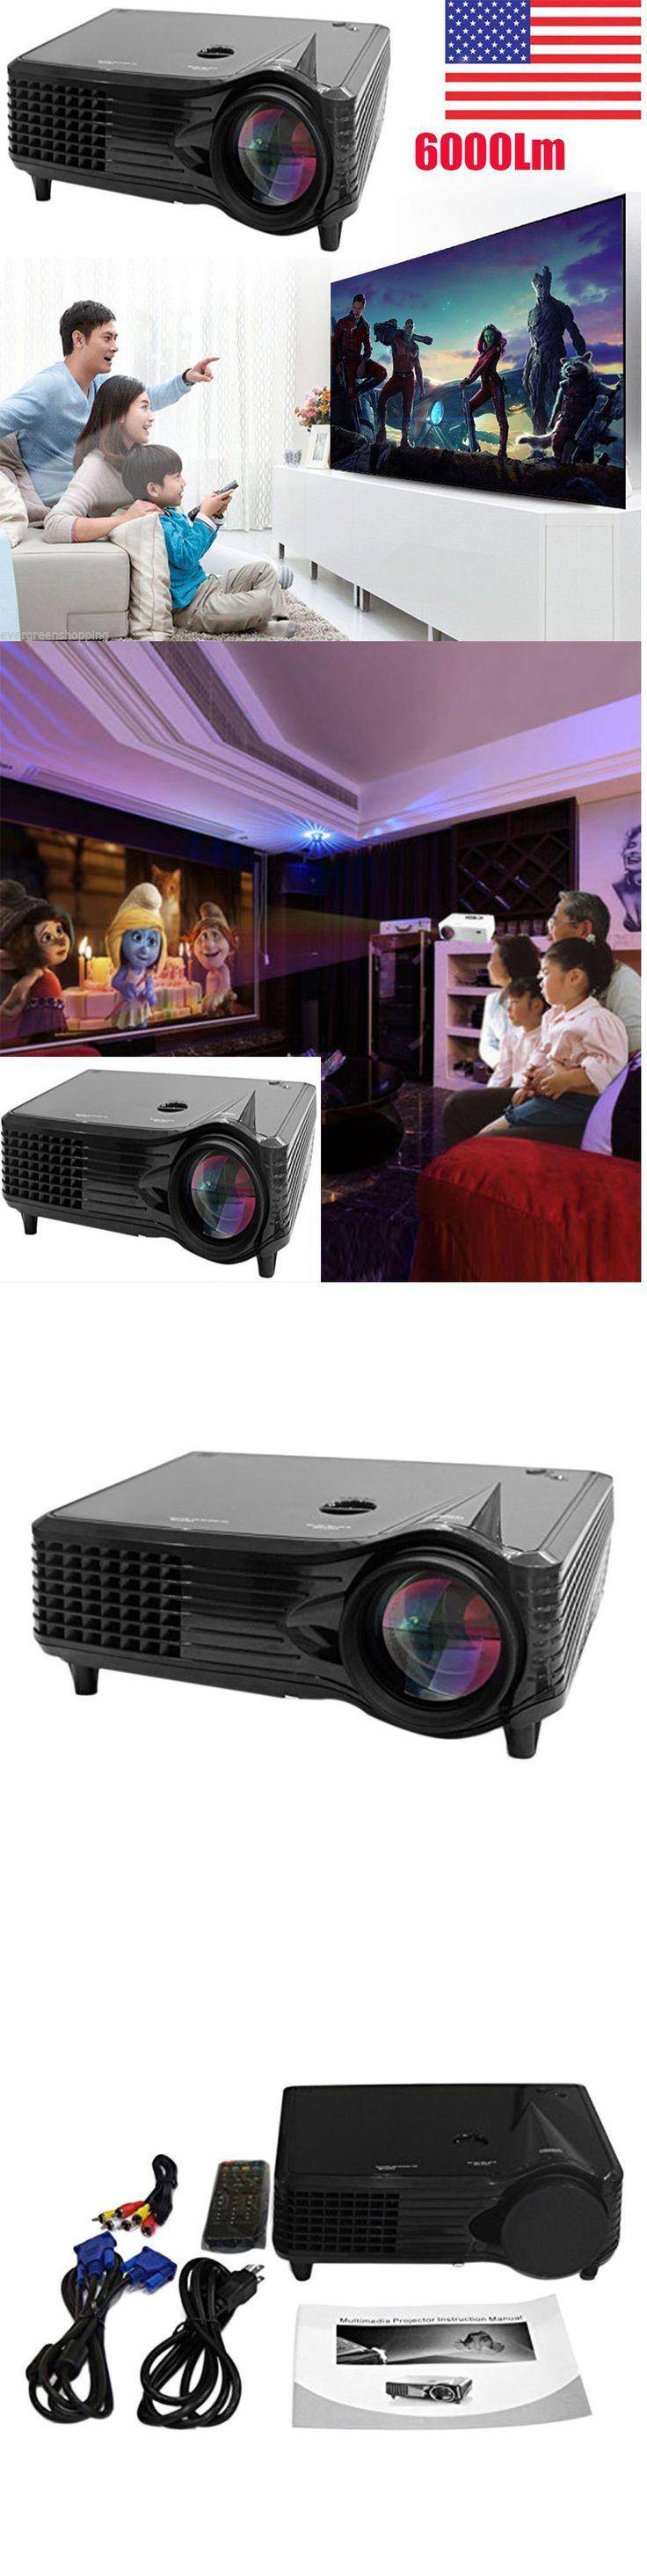 Home Theater Projectors: 6000 Lumens Full Hd 1080P Led Lcd 3D Vga Hdmi Tv Home Theater Projector Cinema B BUY IT NOW ONLY: $127.95 #hometheaterhacks #hometheaterprojectordiy